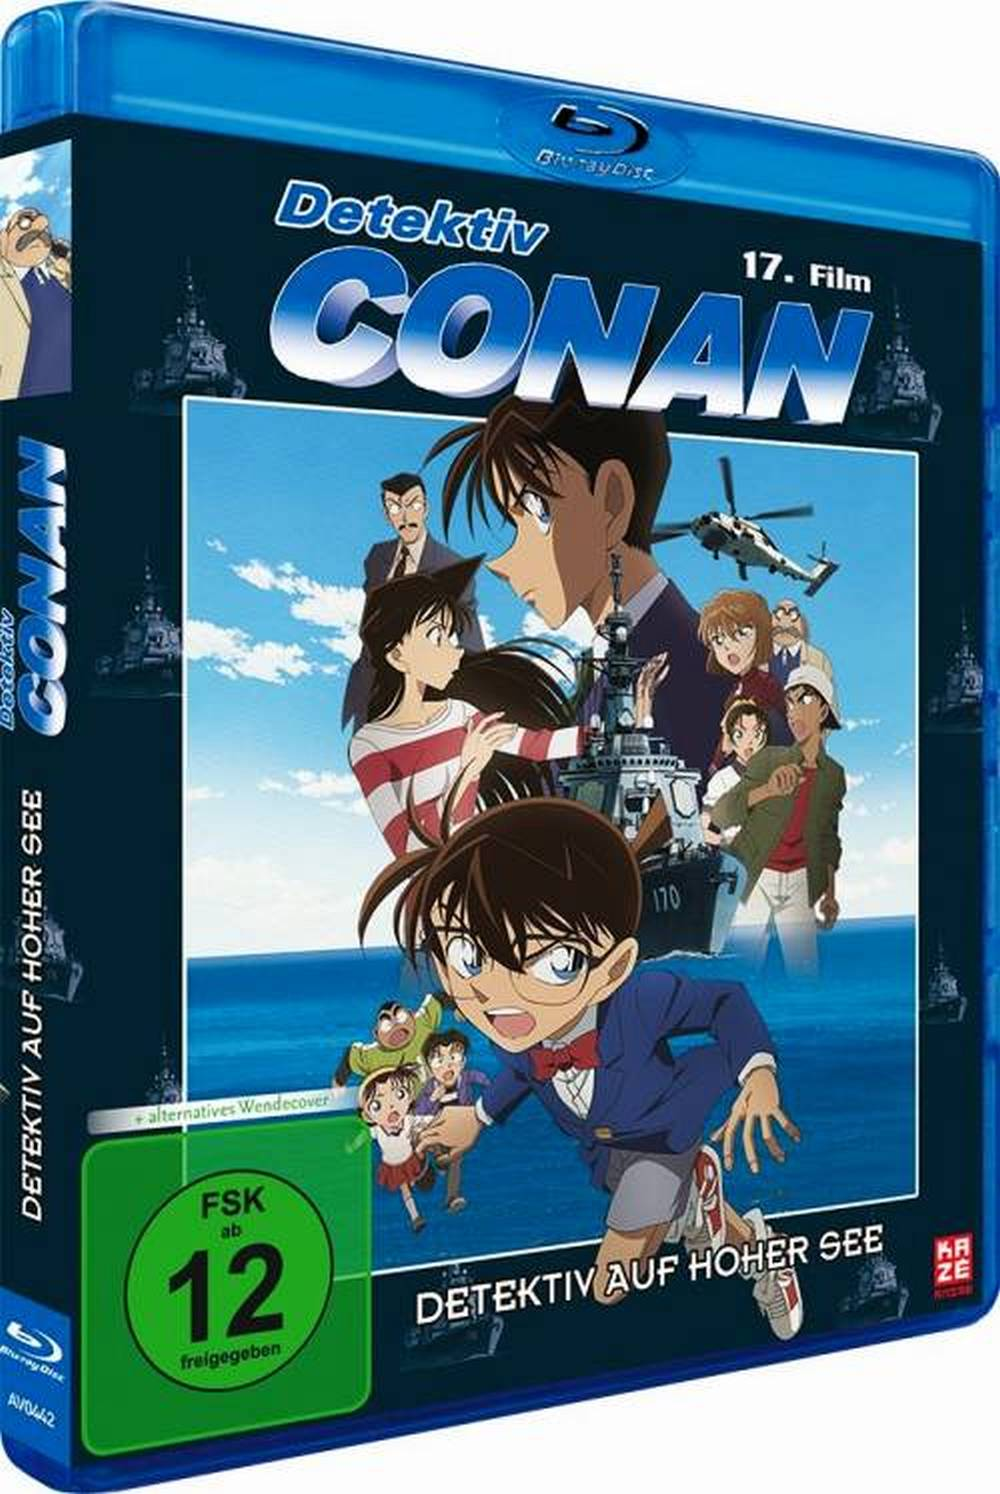 Detektiv Conan Movie 17